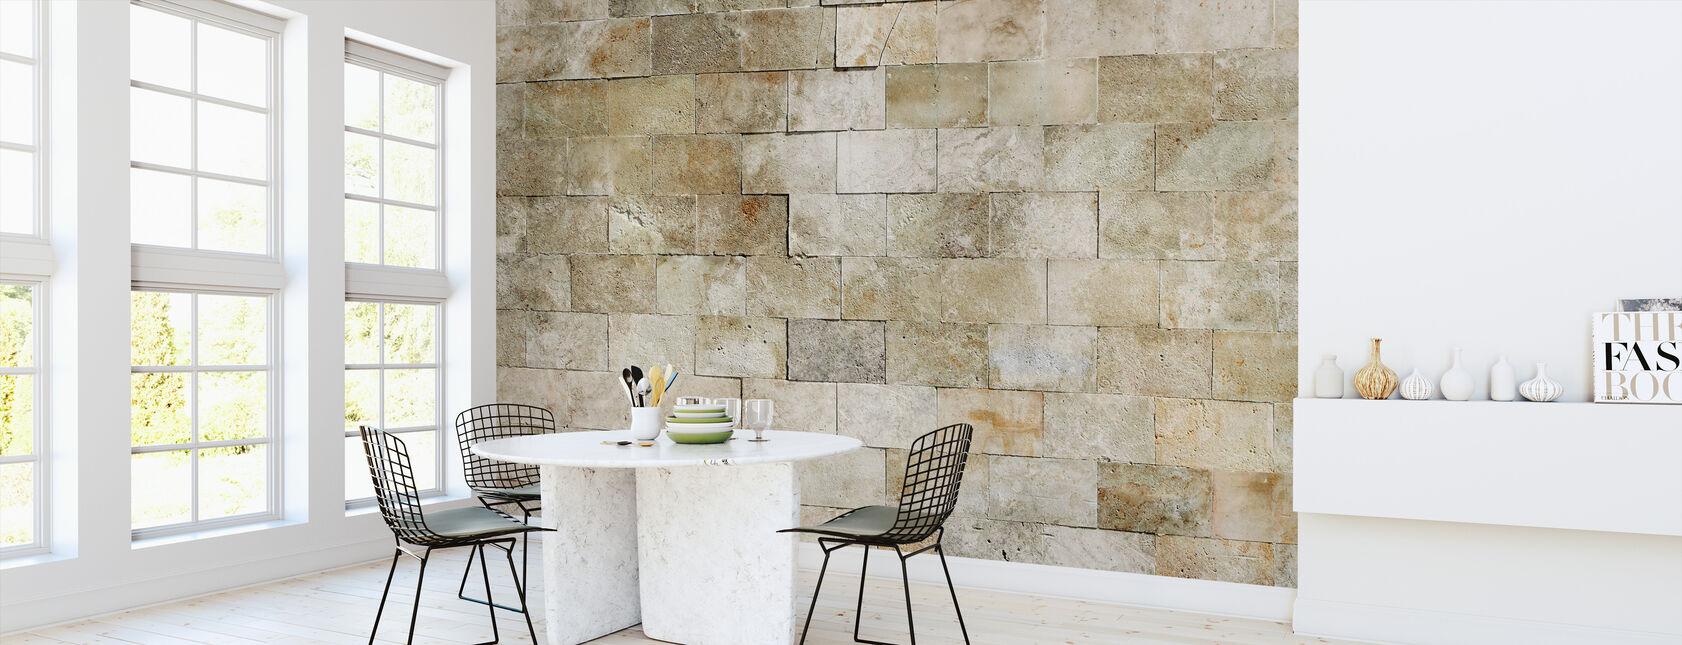 Tiled Stone Wall - Wallpaper - Kitchen